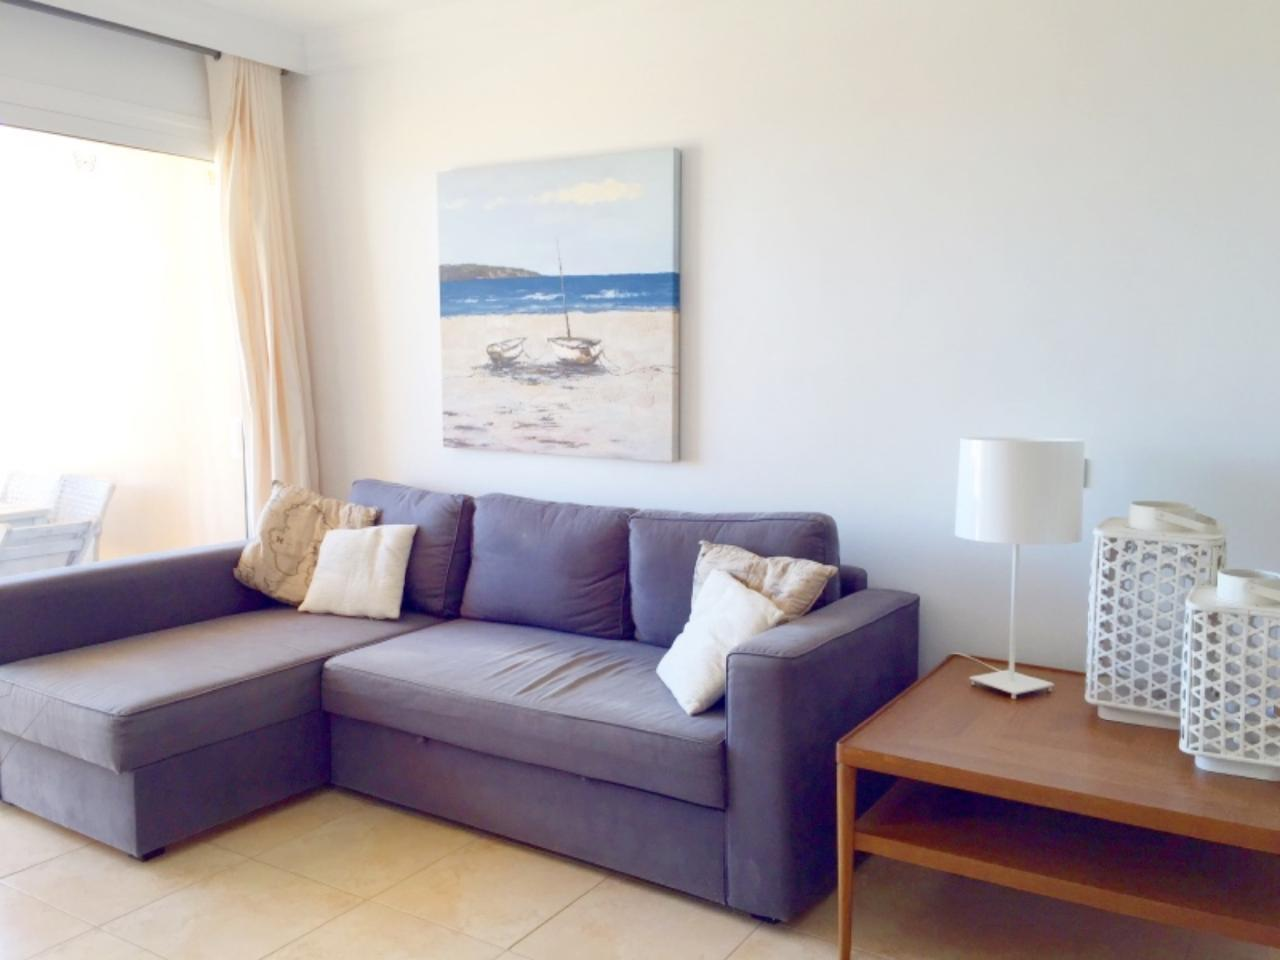 Appartement de vacances Apartment mit Meerblick, Satellitenfernsehen (2412056), Poris de Abona, Ténérife, Iles Canaries, Espagne, image 6